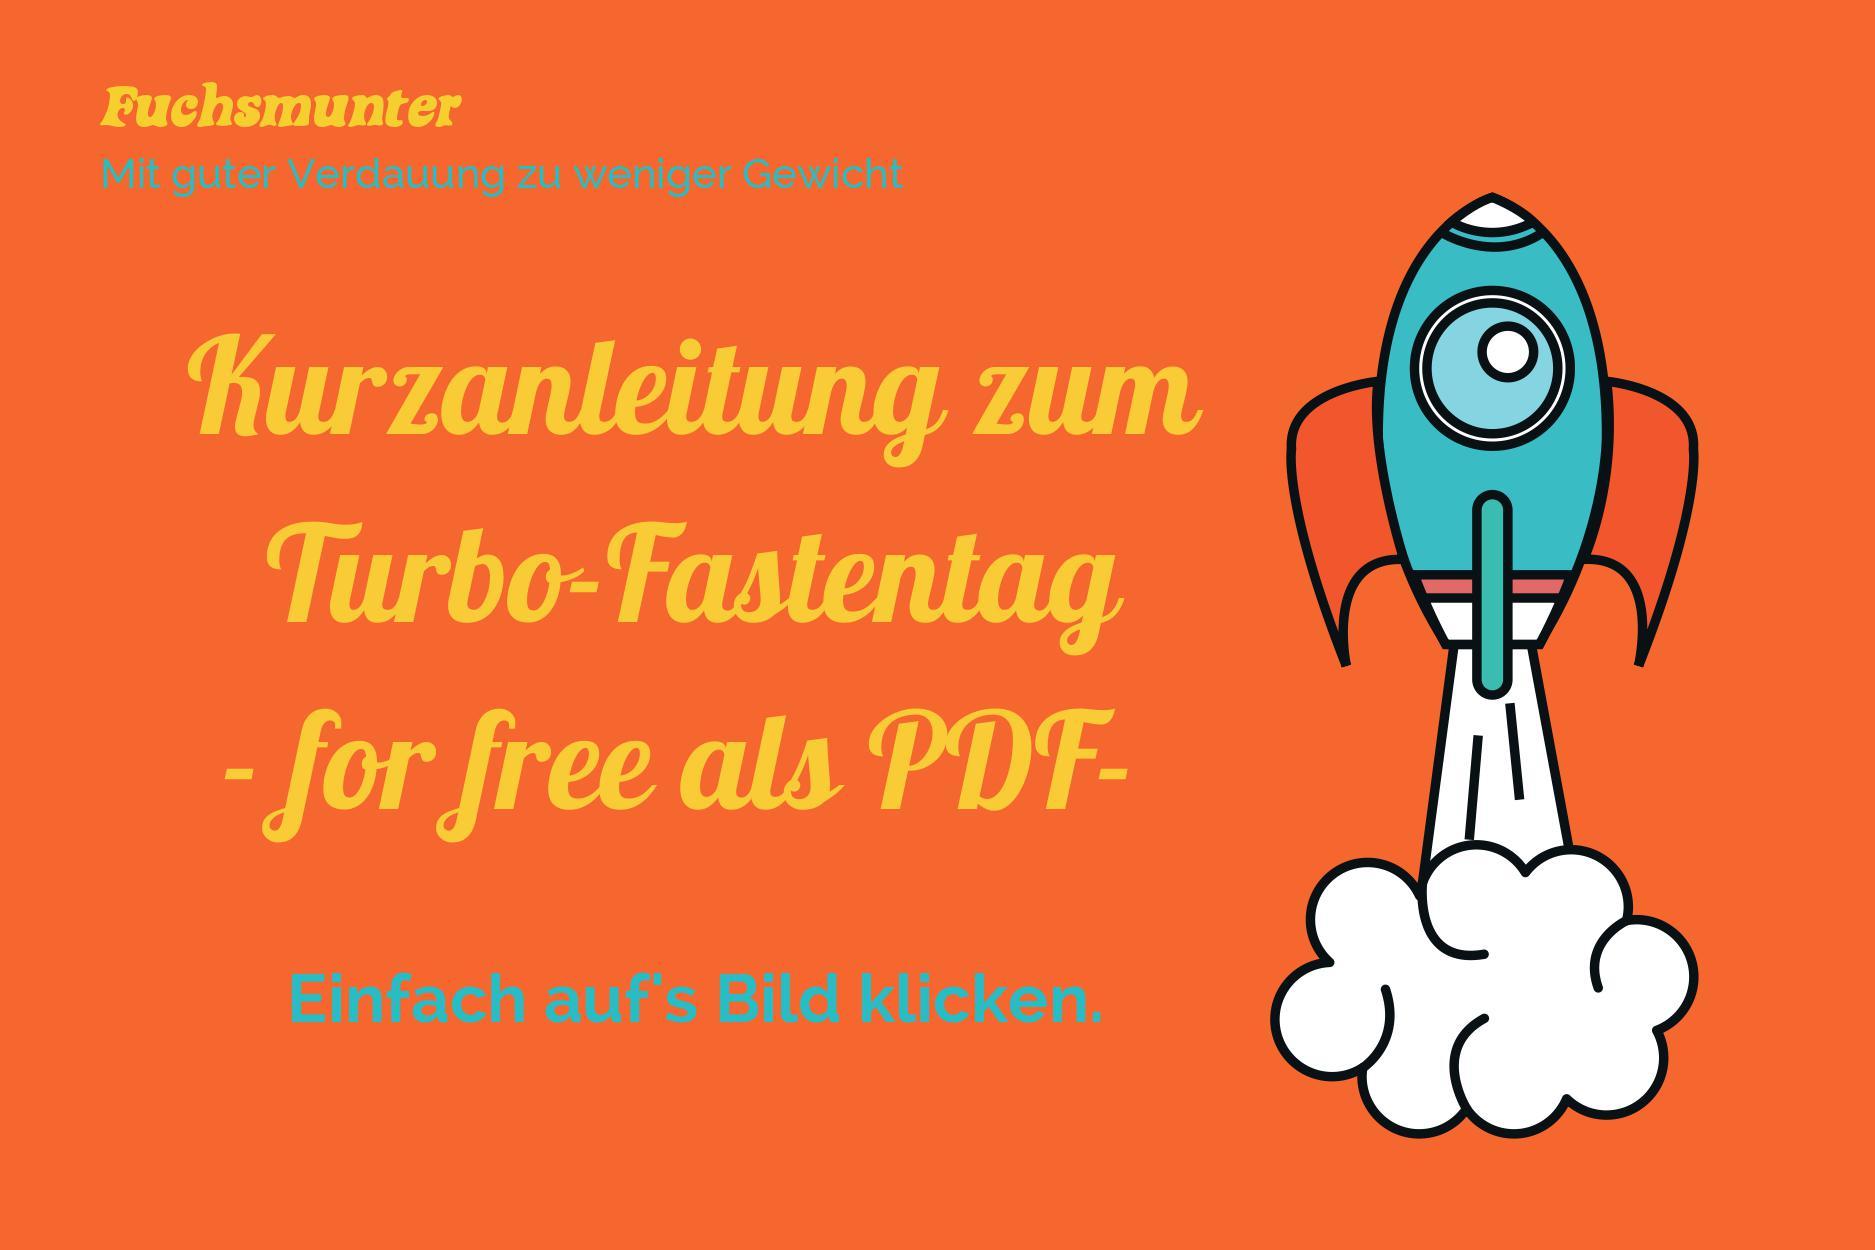 Kurzanleitung zum Turbo-Fastentag